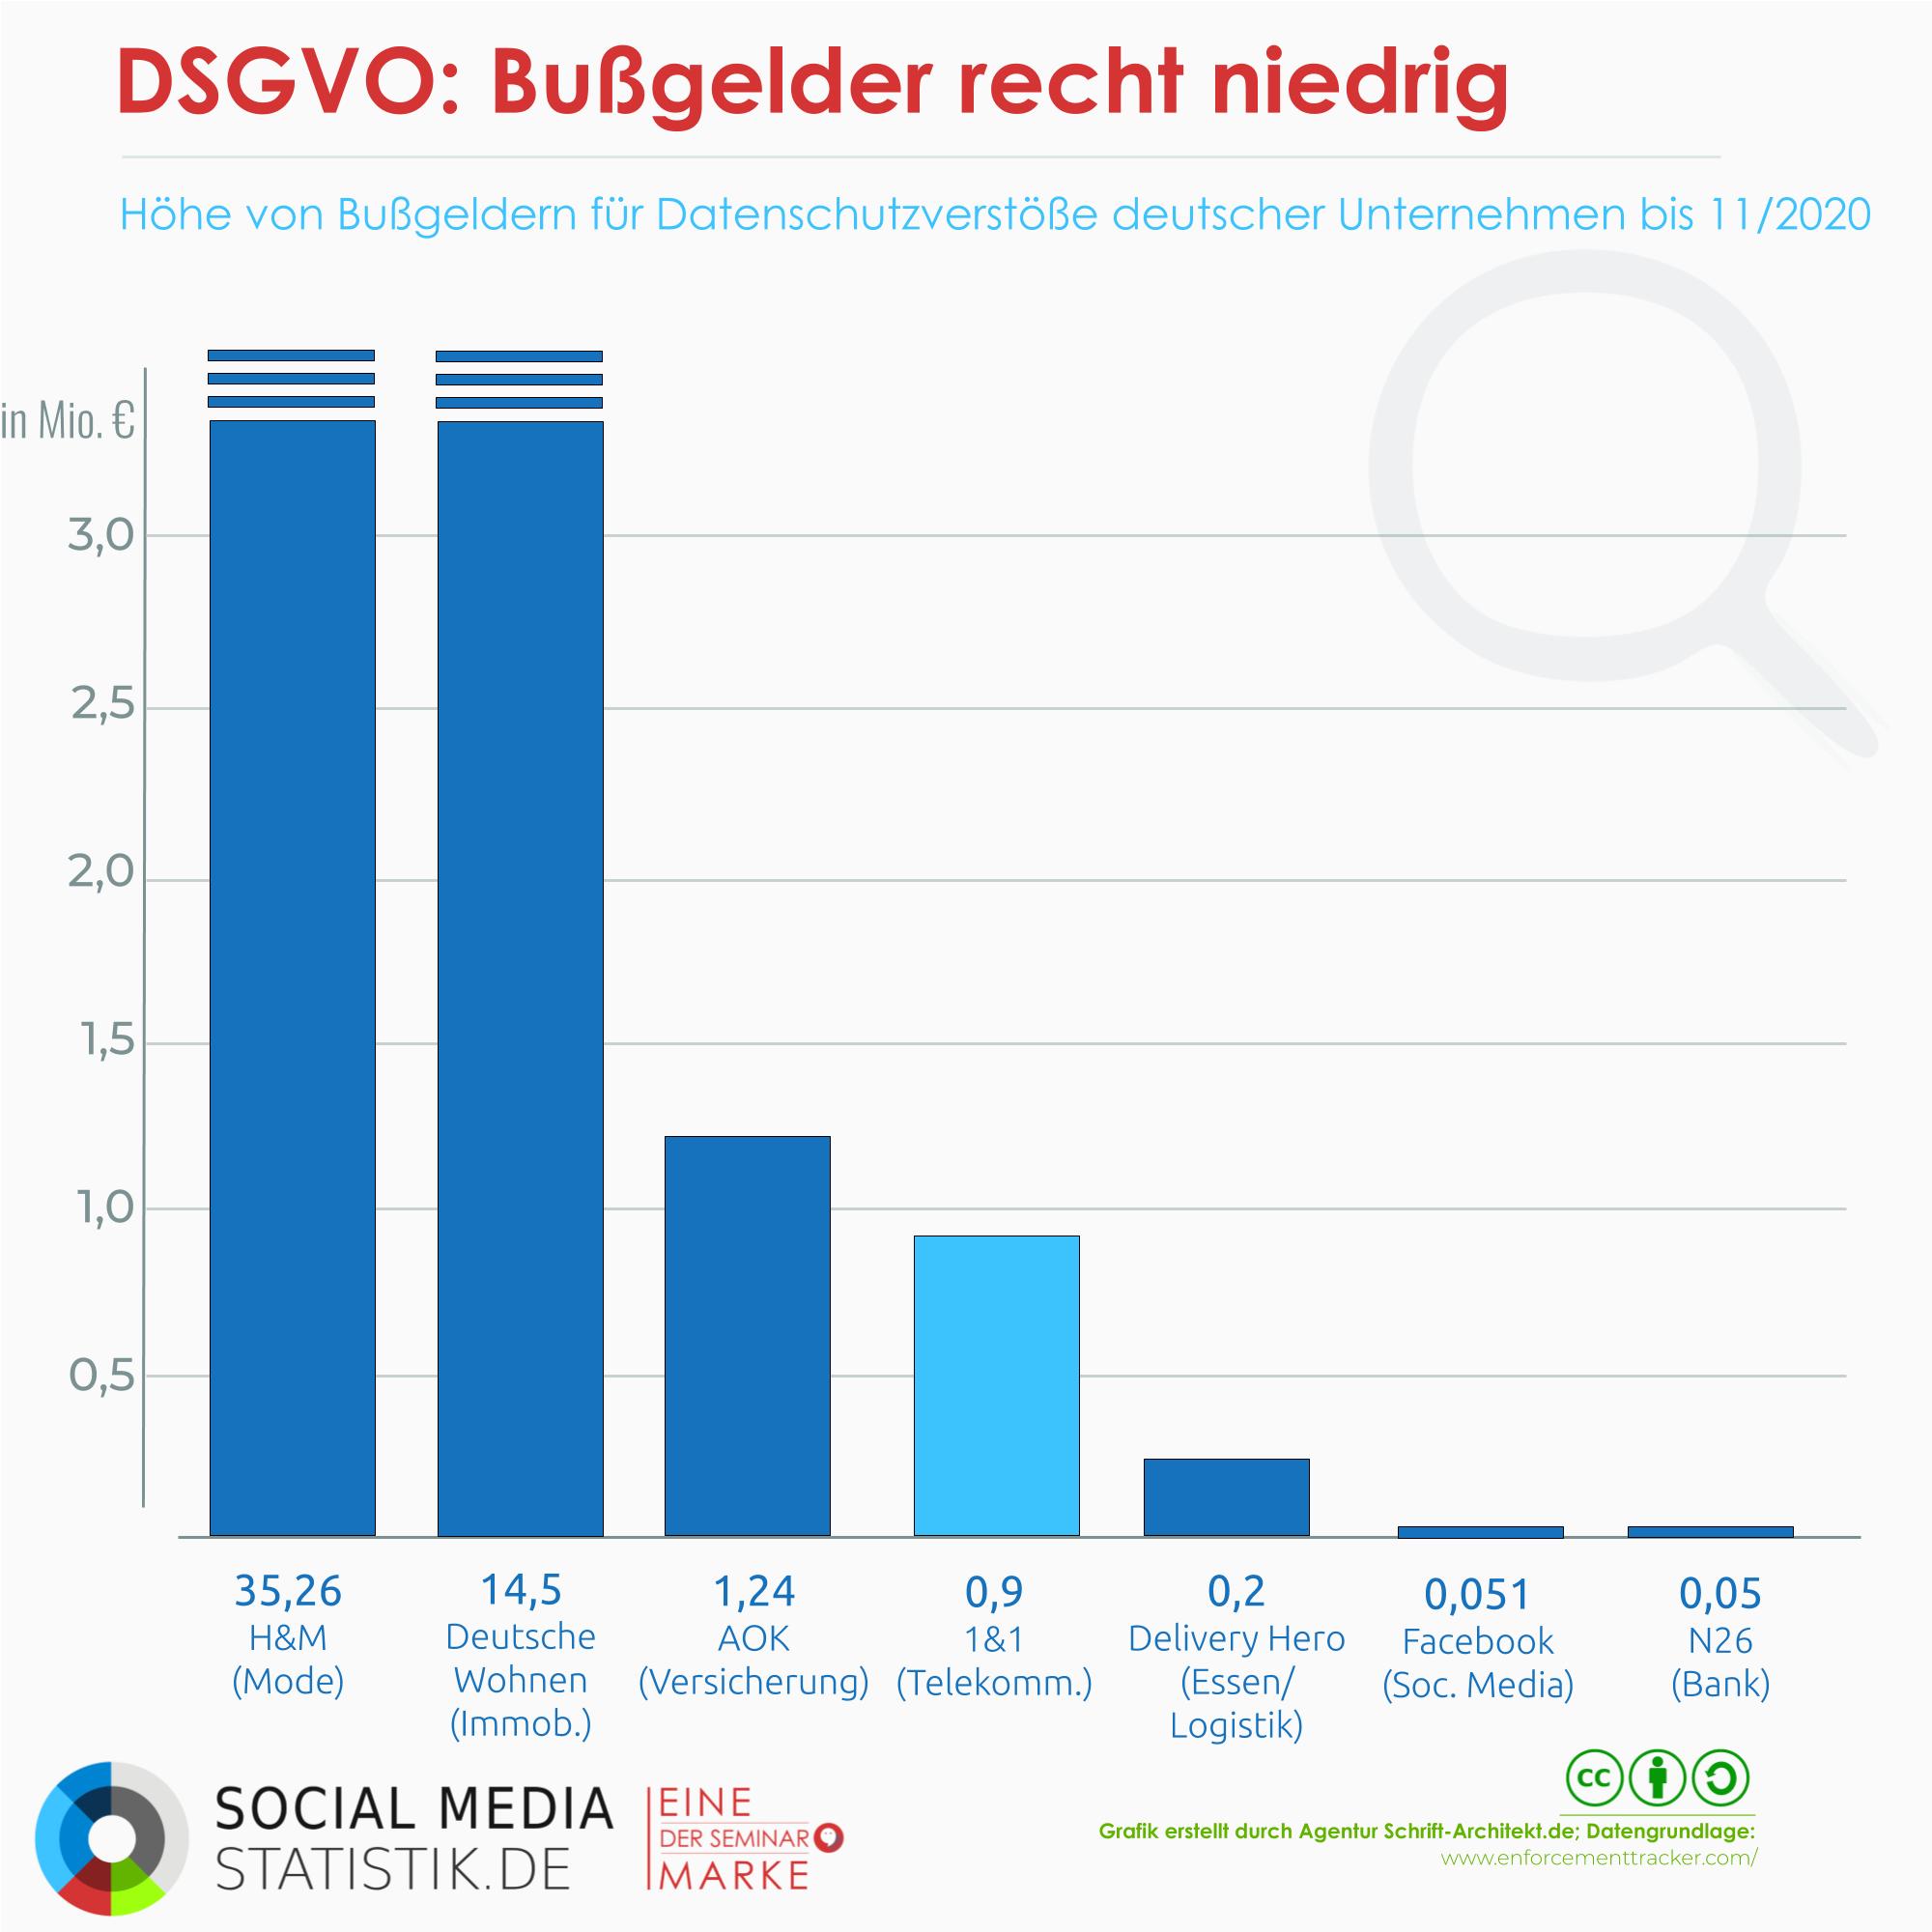 Infografik Social Media Statistik zum Thema dsgvo bußgelder